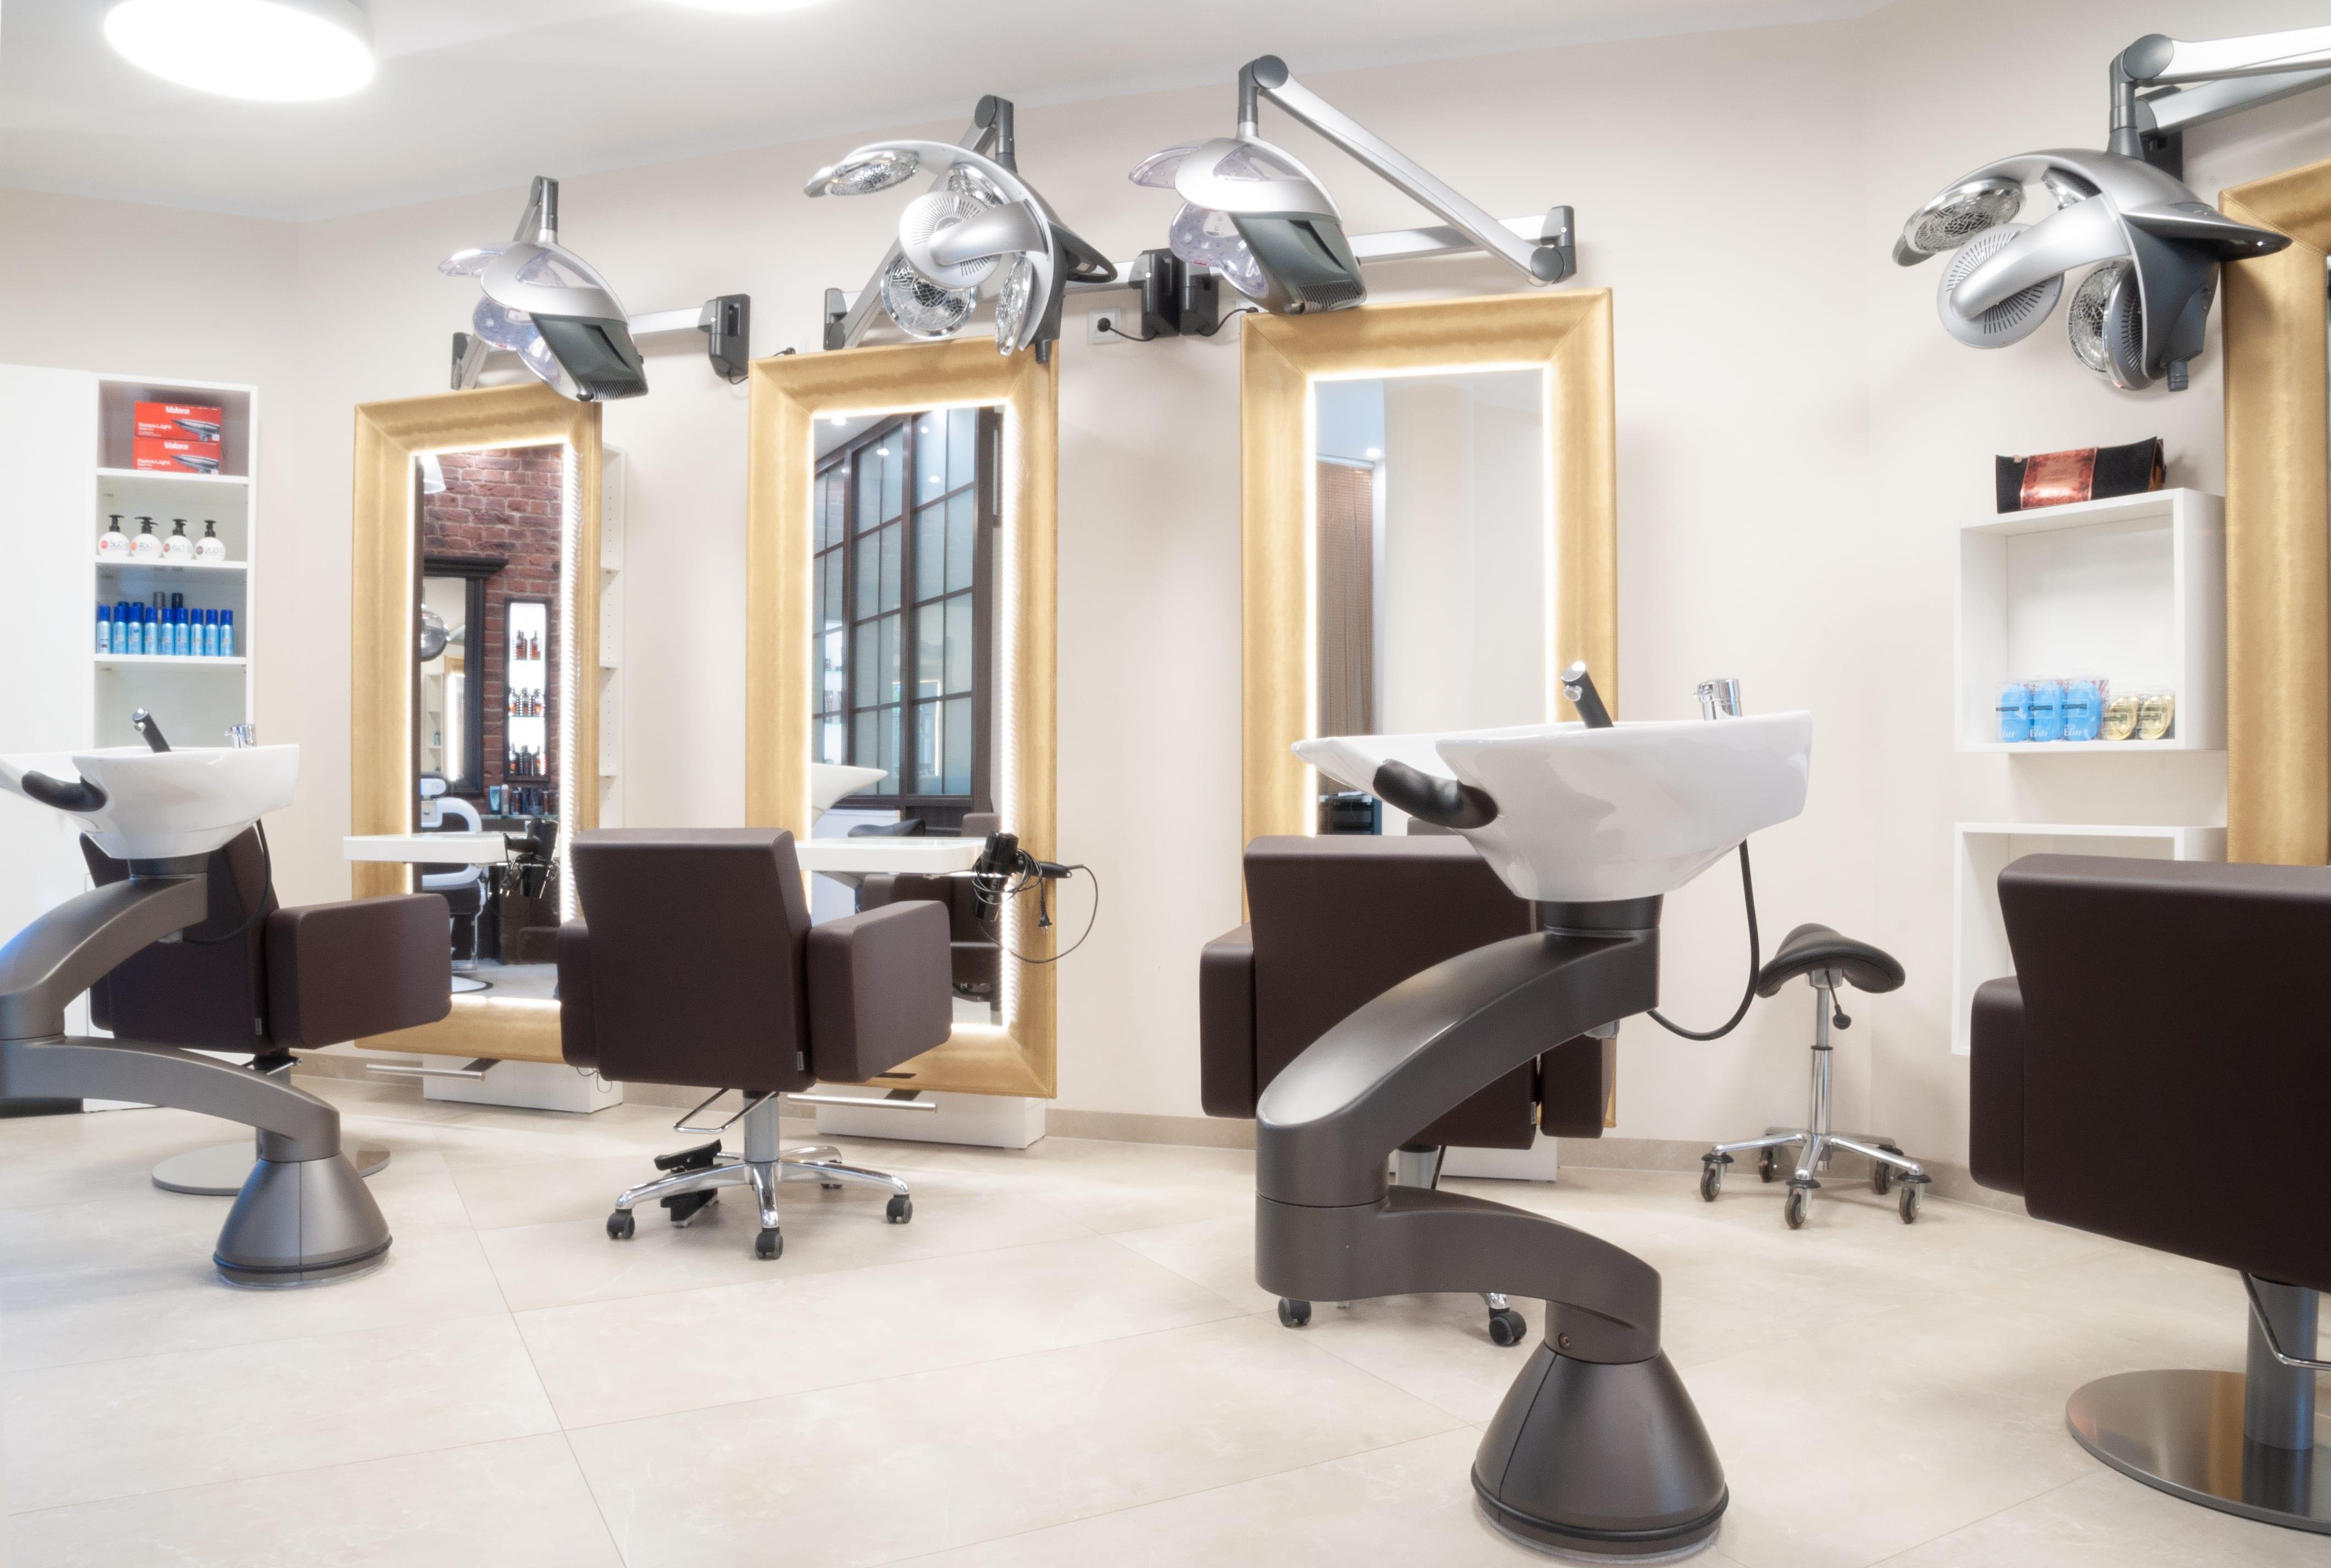 Styling Hair - Friseur-Salon Zorneding mit Wohlfühl-Faktor